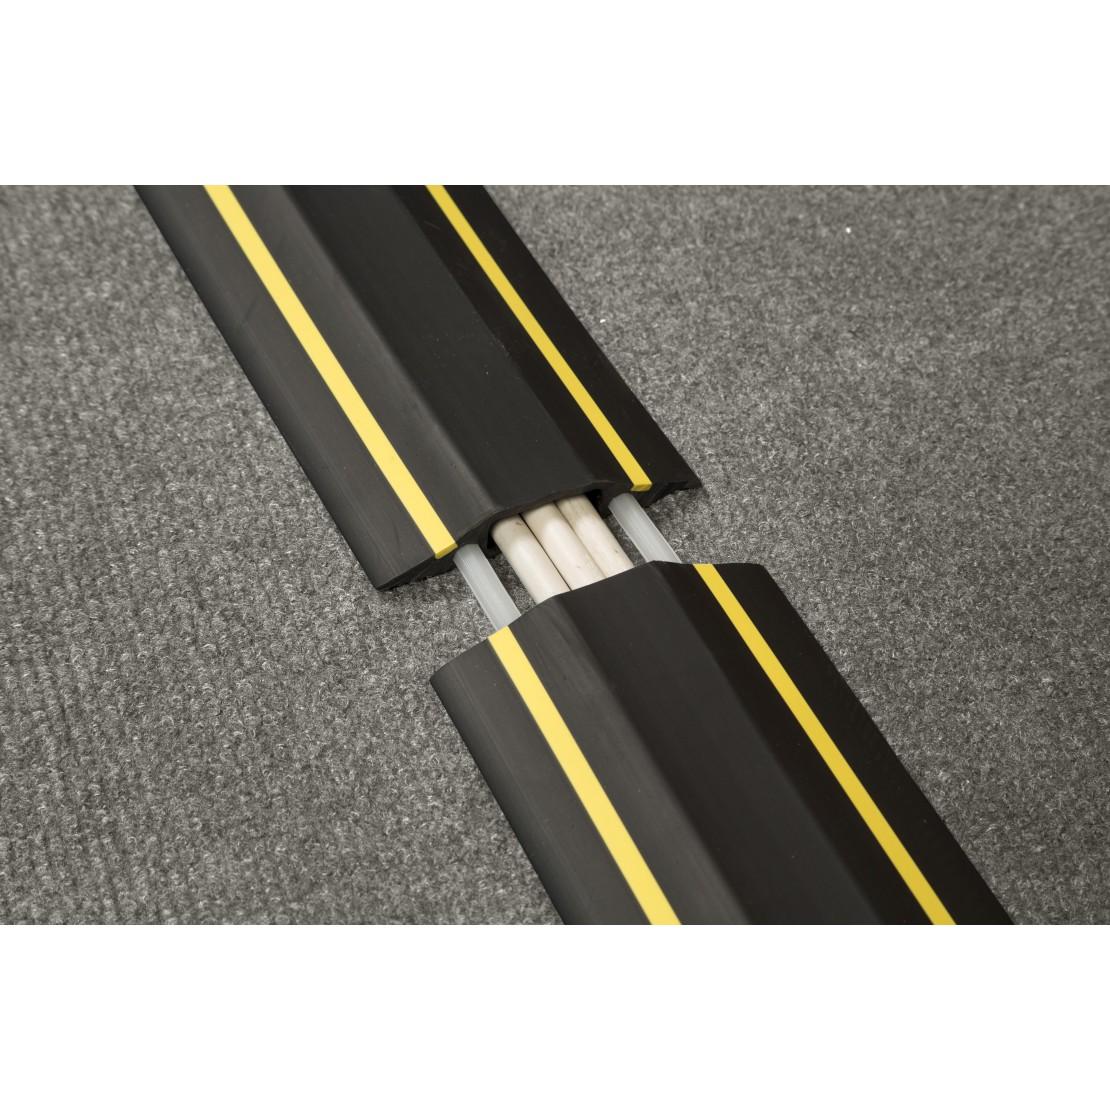 Vloer kabels werk mediumgewicht 80mm x 1.8m lengte